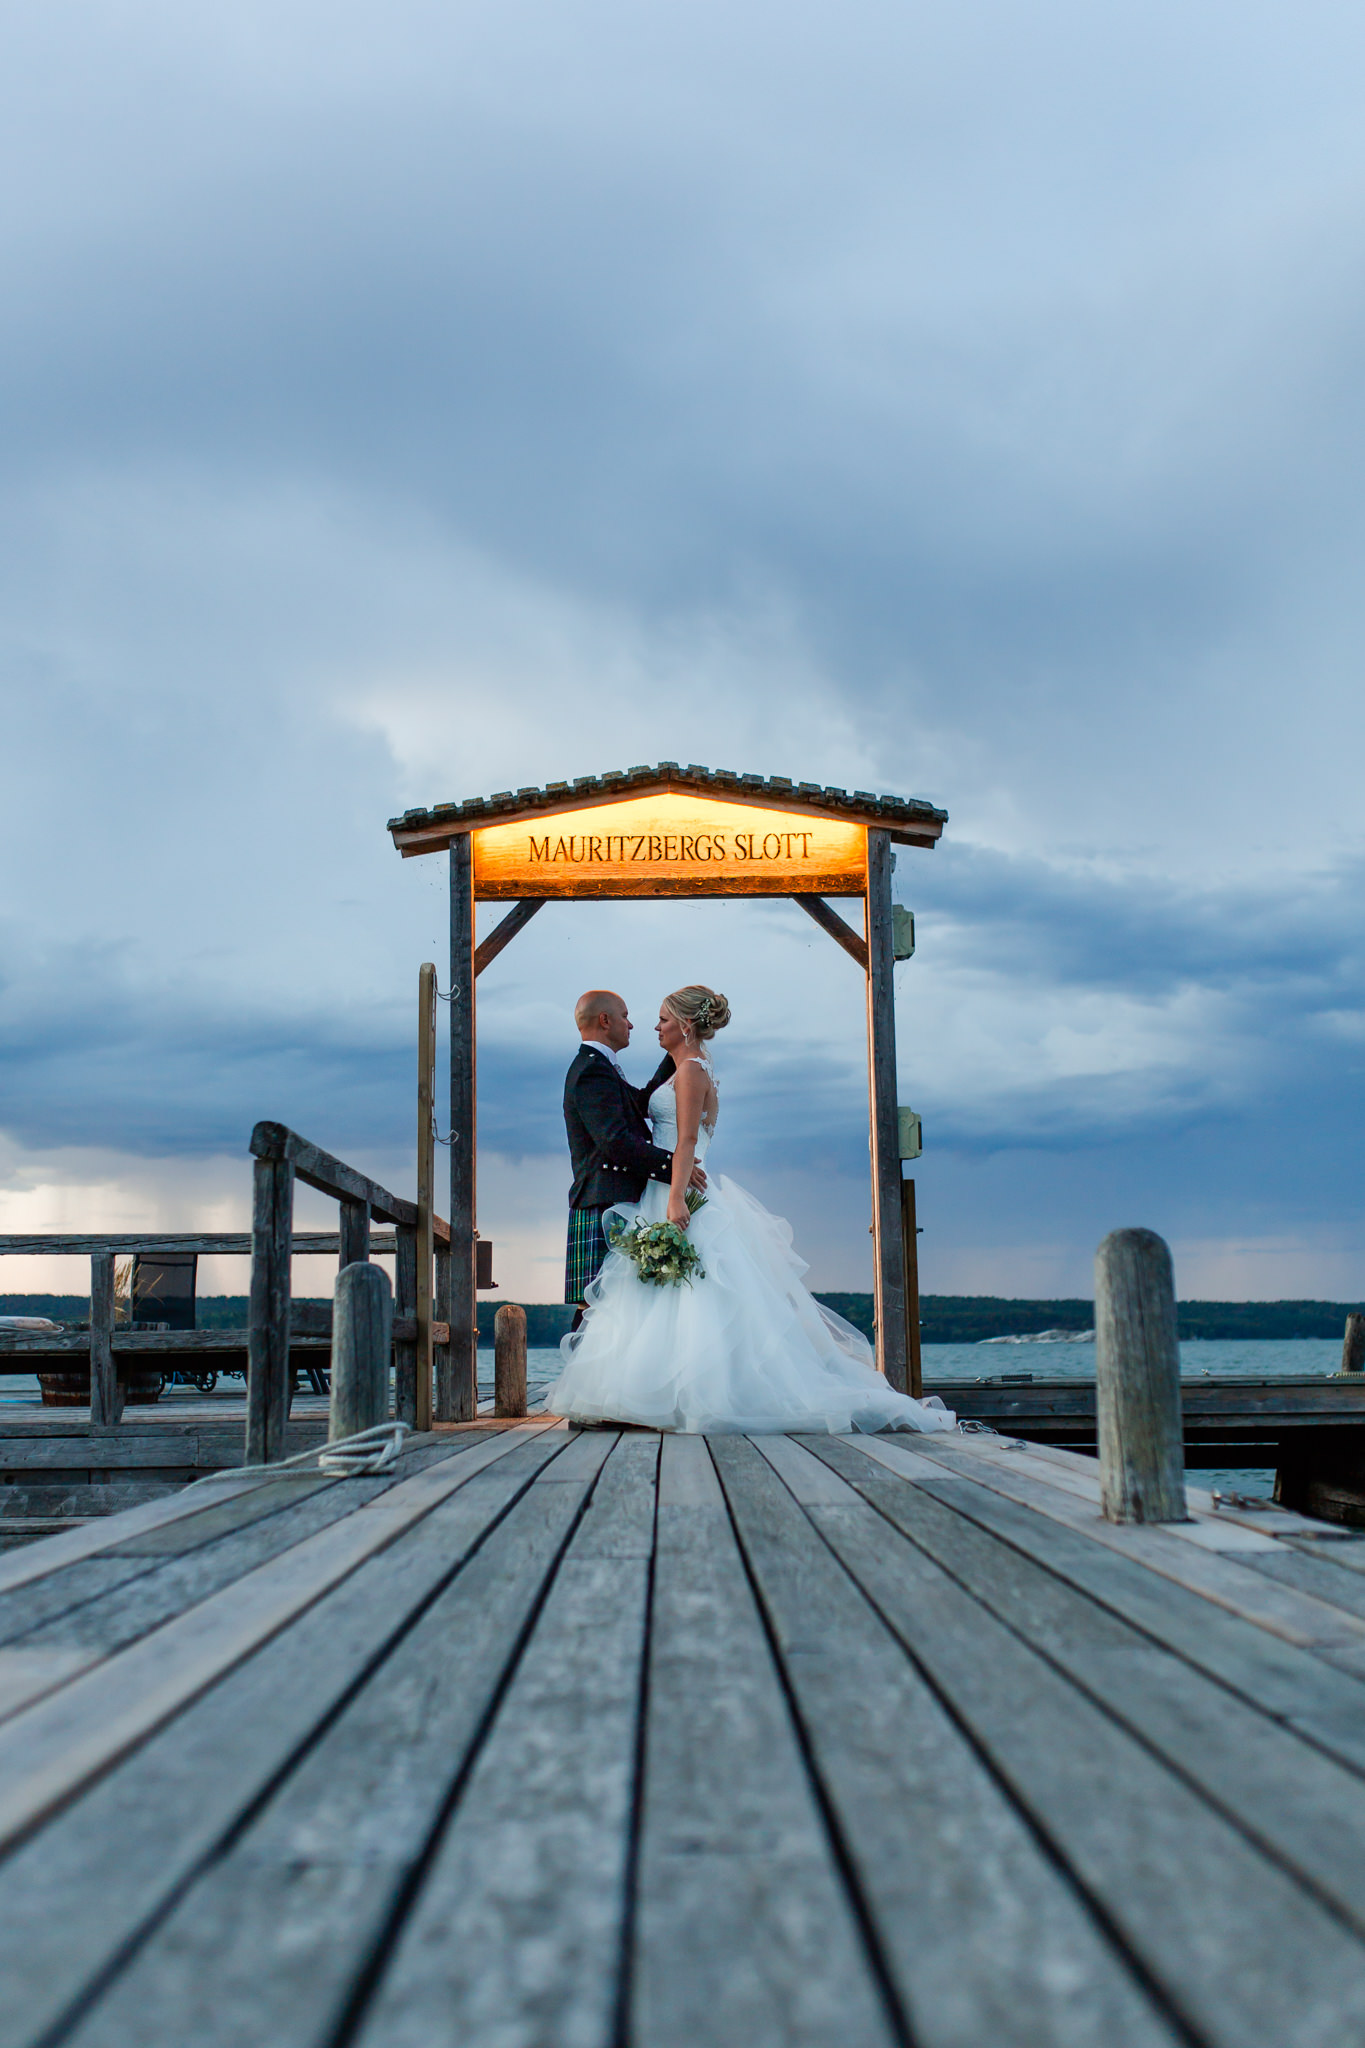 Bröllopsfotografering Mauritzberg Slott golden hour